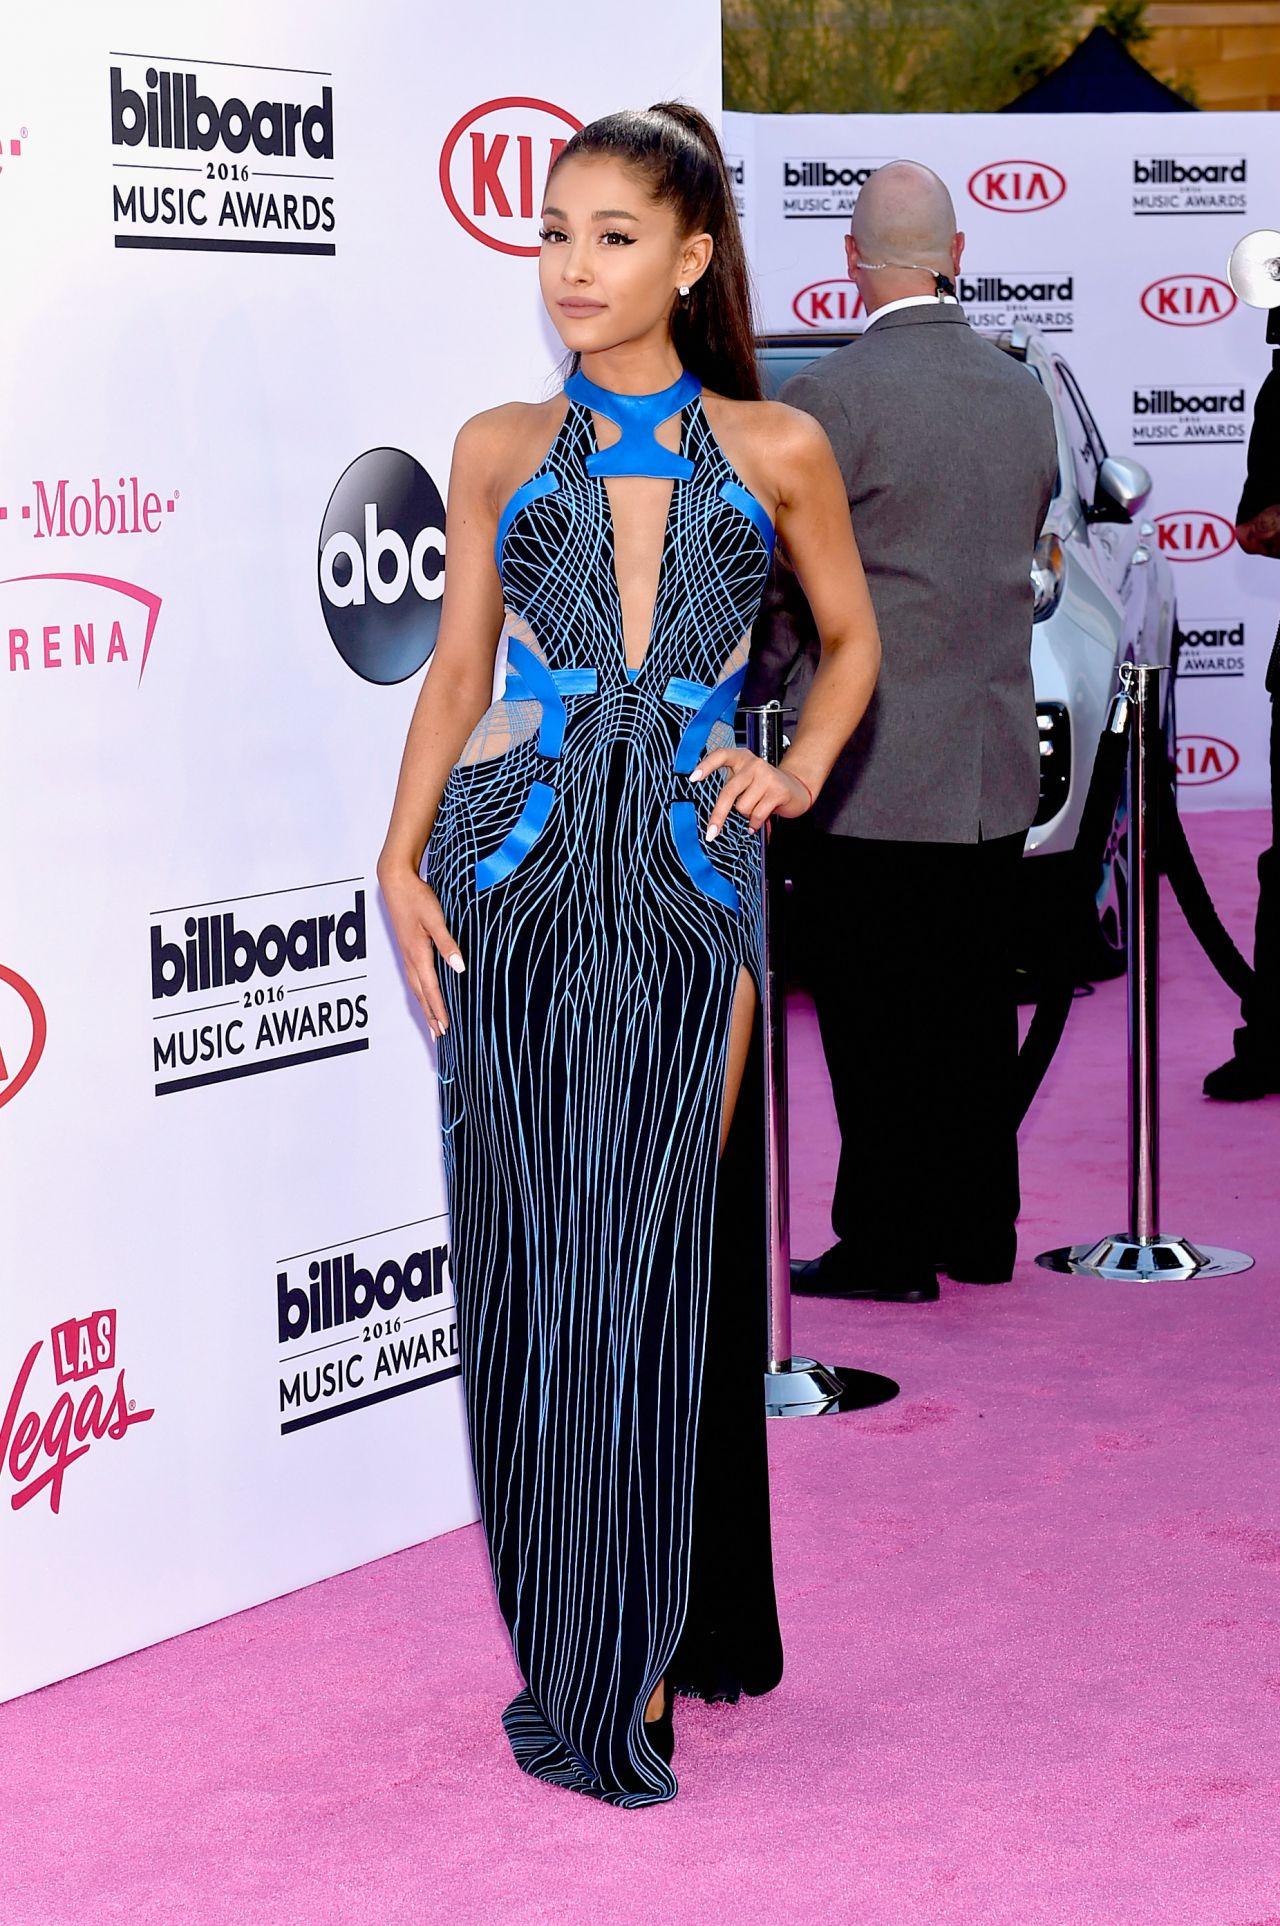 Billboard Music Awards 2016 The Best Hair And Makeup: 2016 Billboard Music Awards In Las Vegasm NV